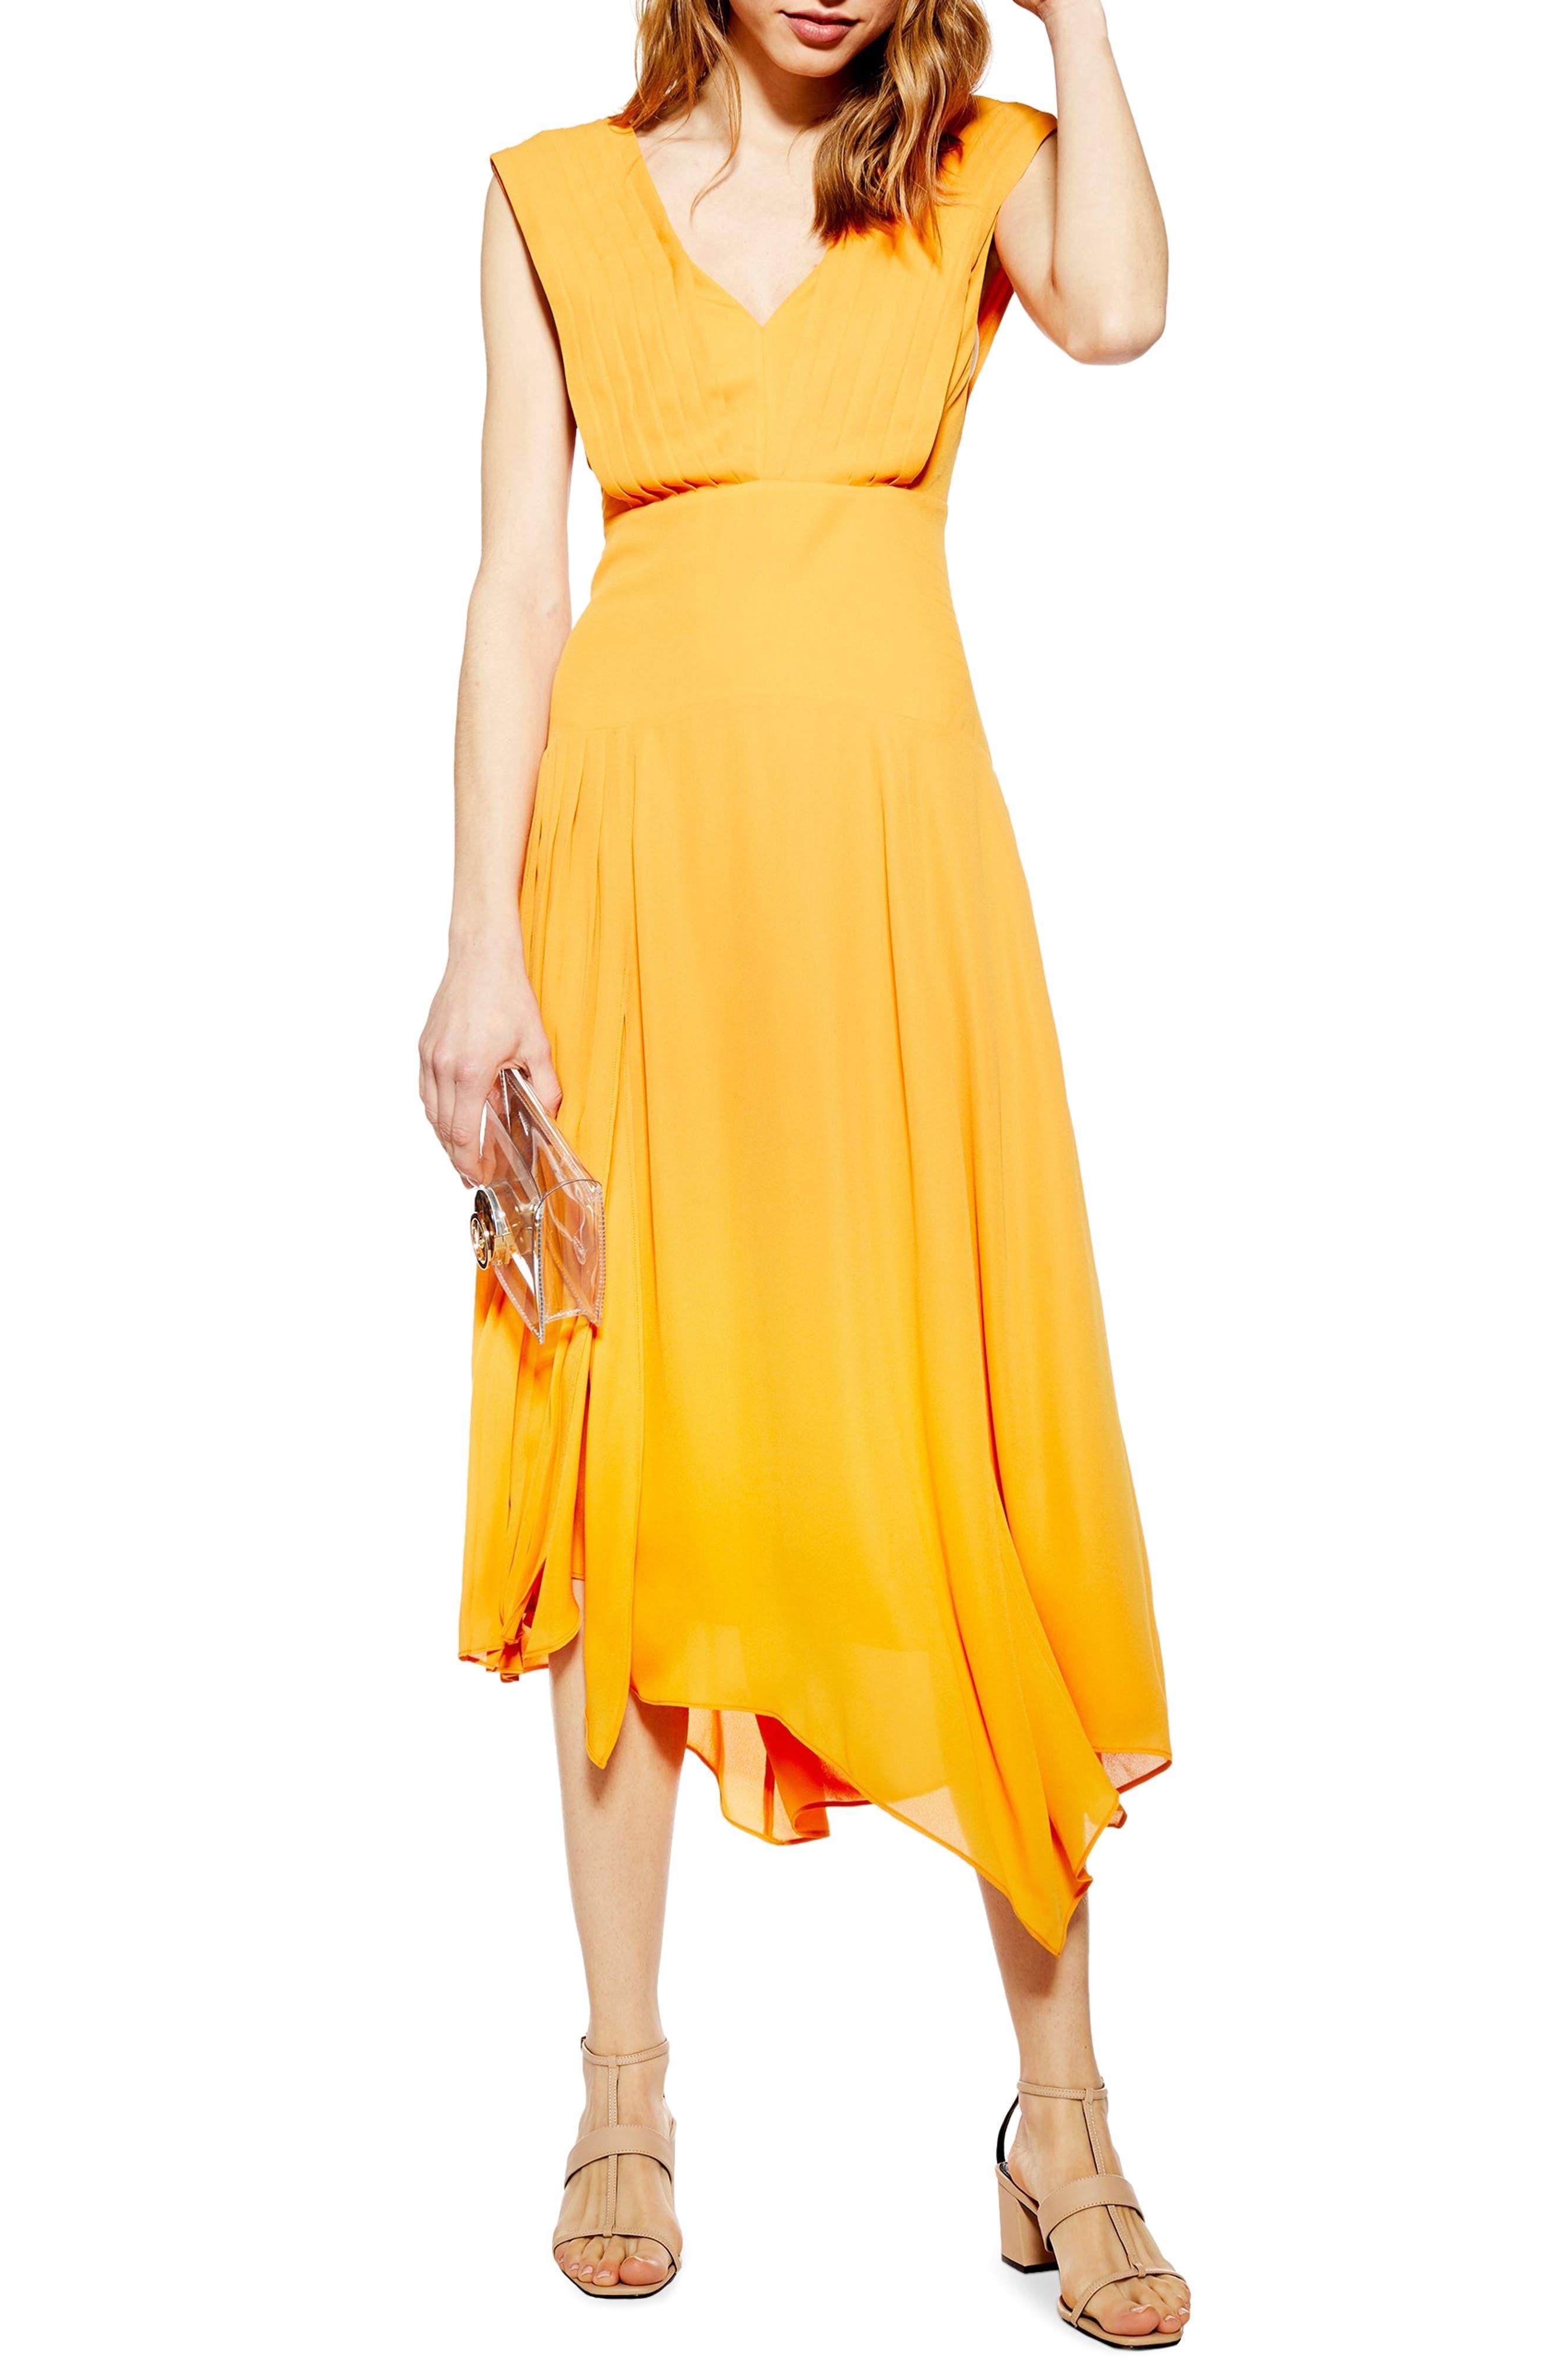 Topshop Pleated Pinafore Midi Dress, US (fits like 0) - Yellow